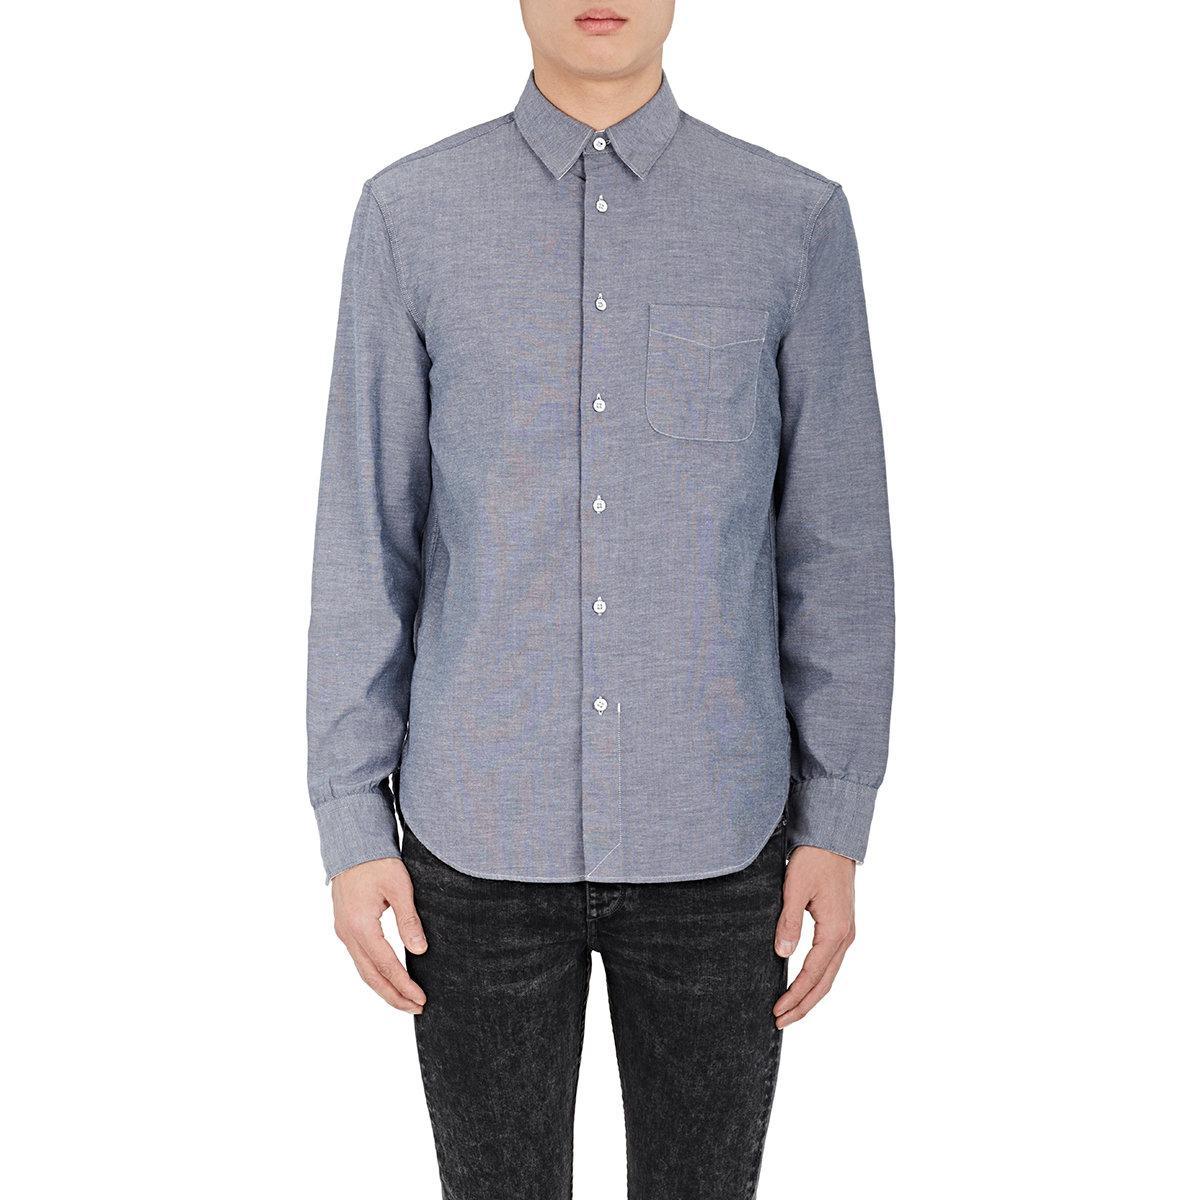 Lyst rag bone beach cotton gauze shirt in blue for men for Rag bone shirt